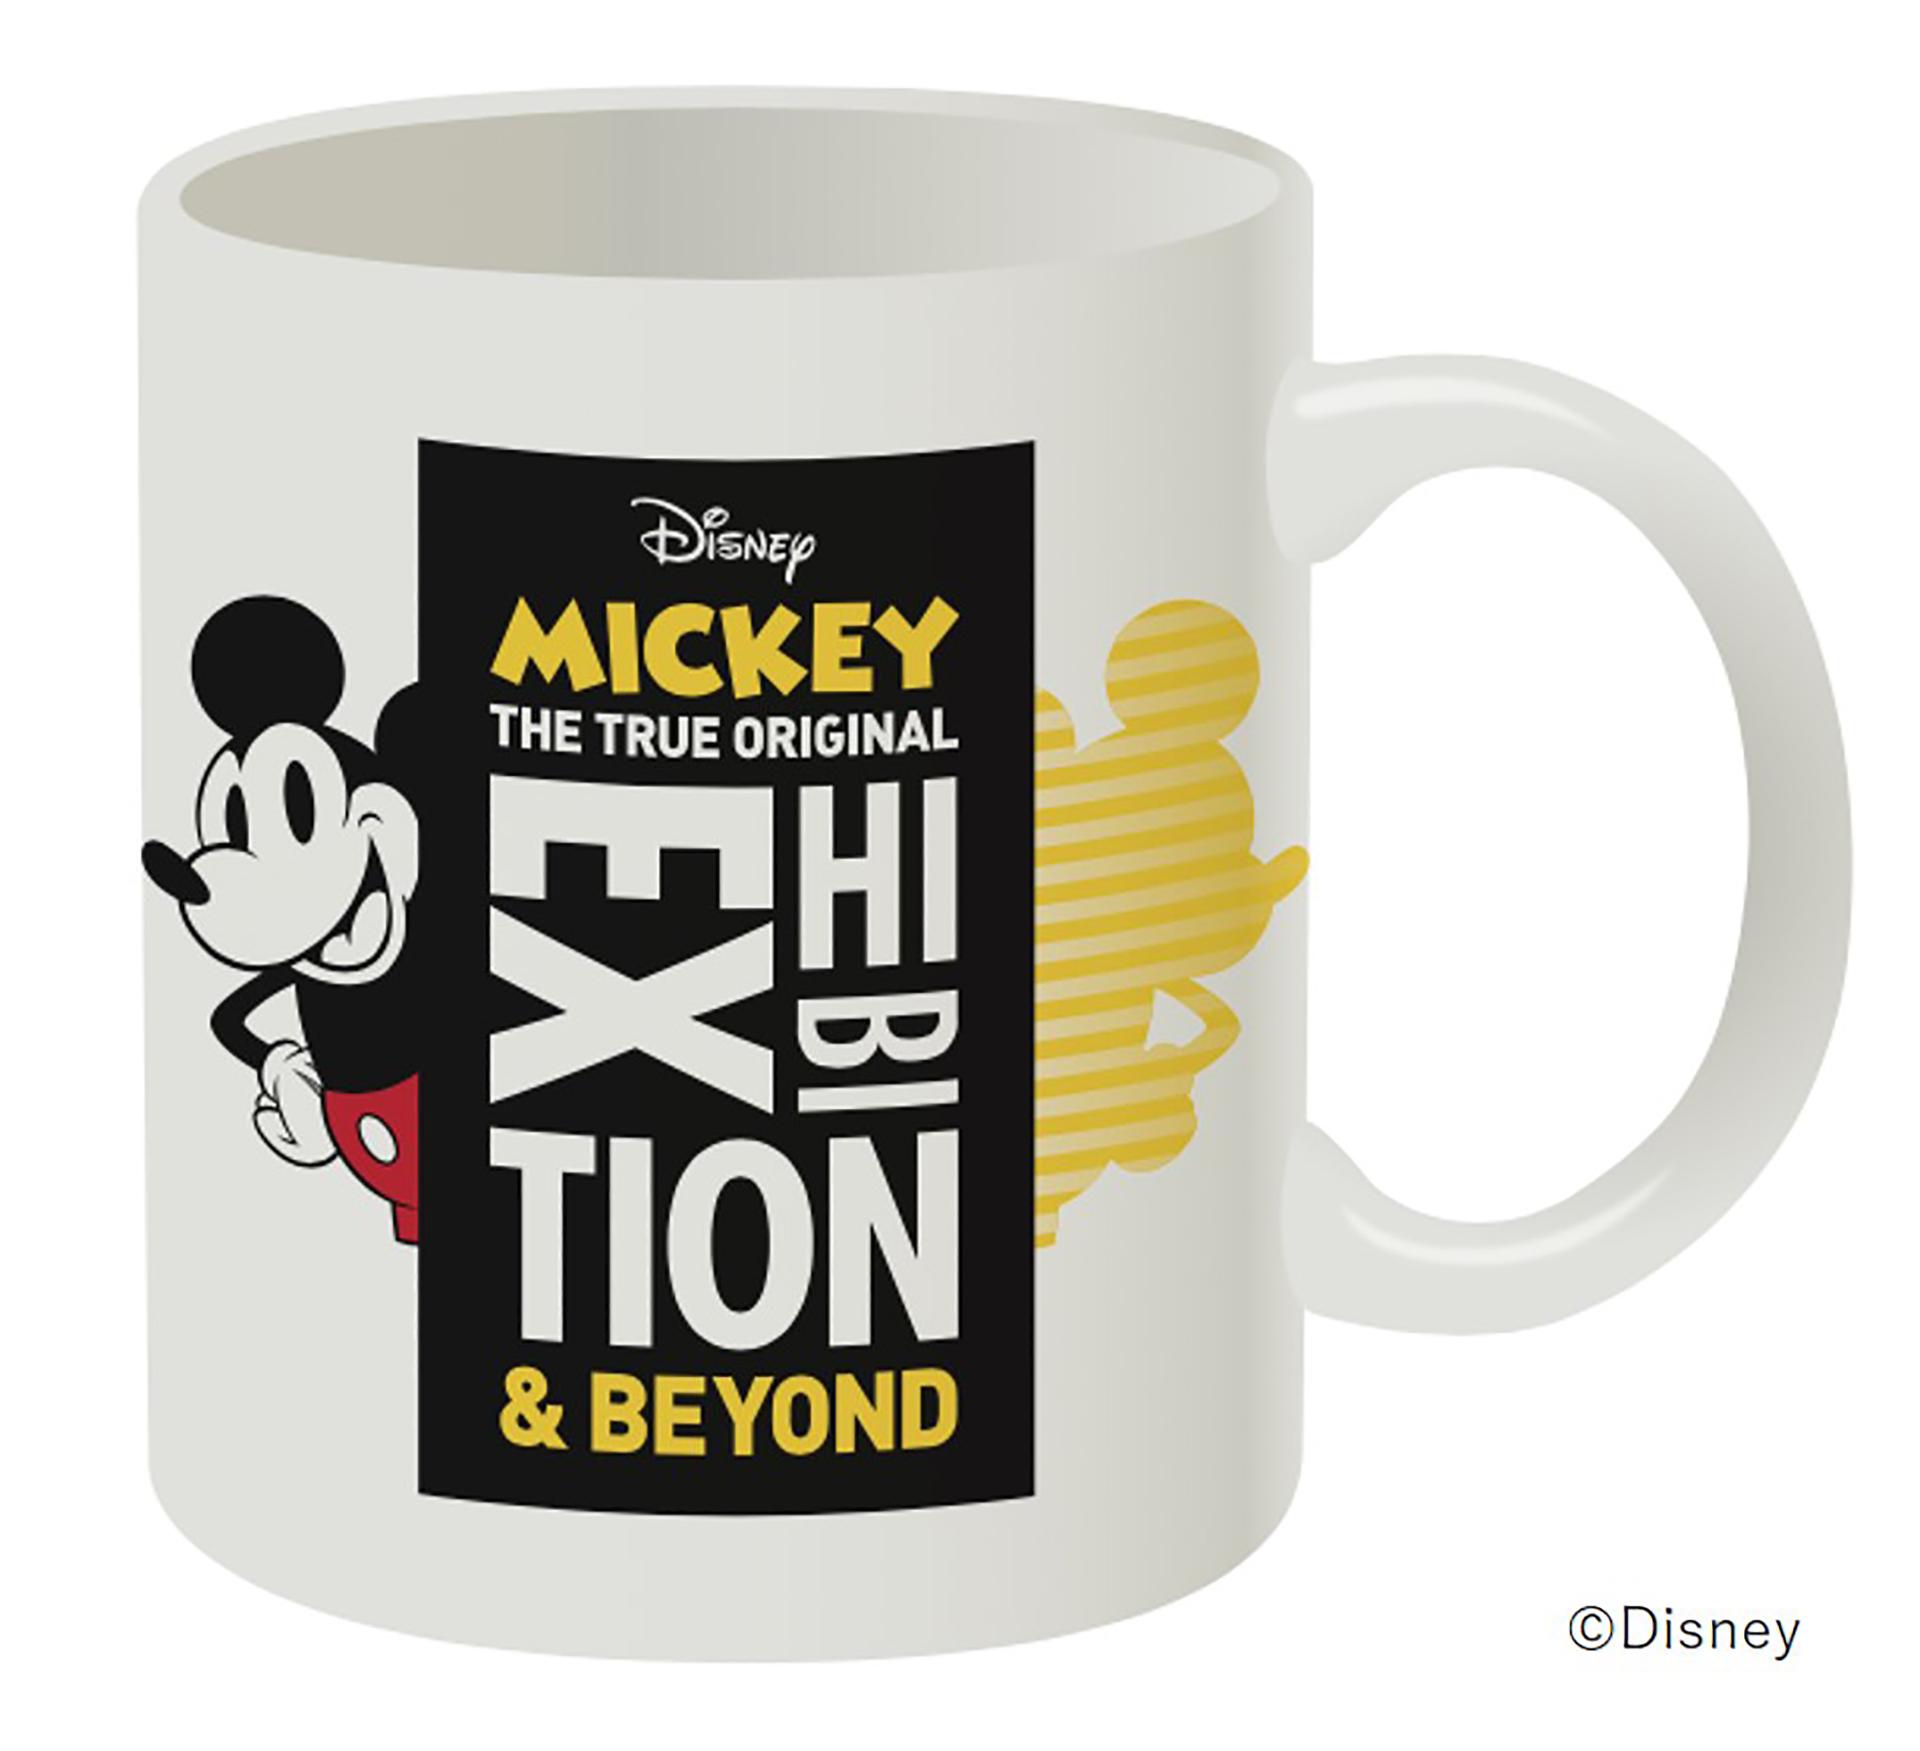 MICKEY: THE TRUE ORIGINAL